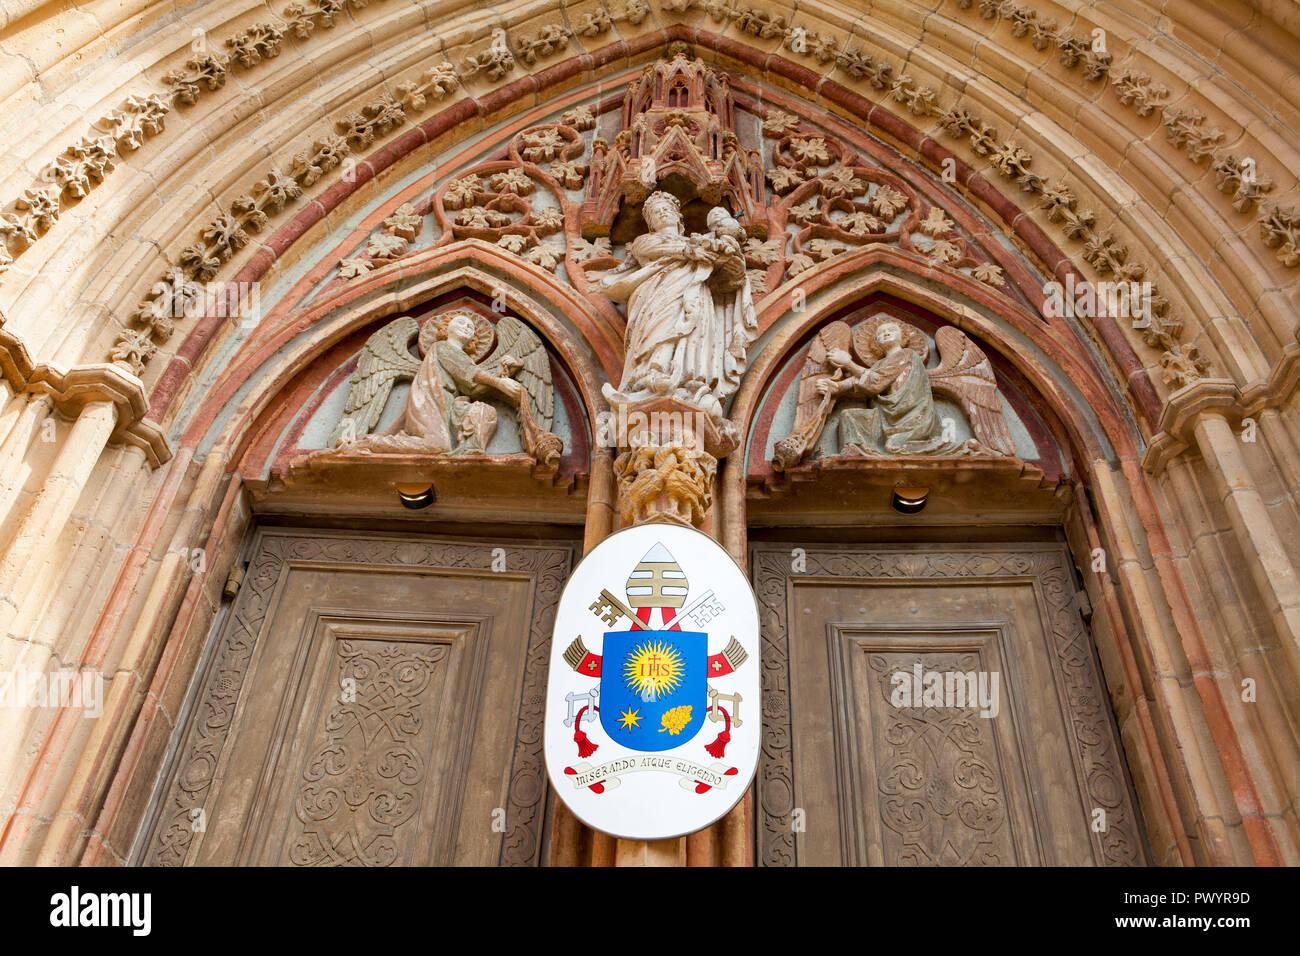 St. Cyriacus' Church, Duderstadt, Lower Saxony, Germany, Europe - Stock Image